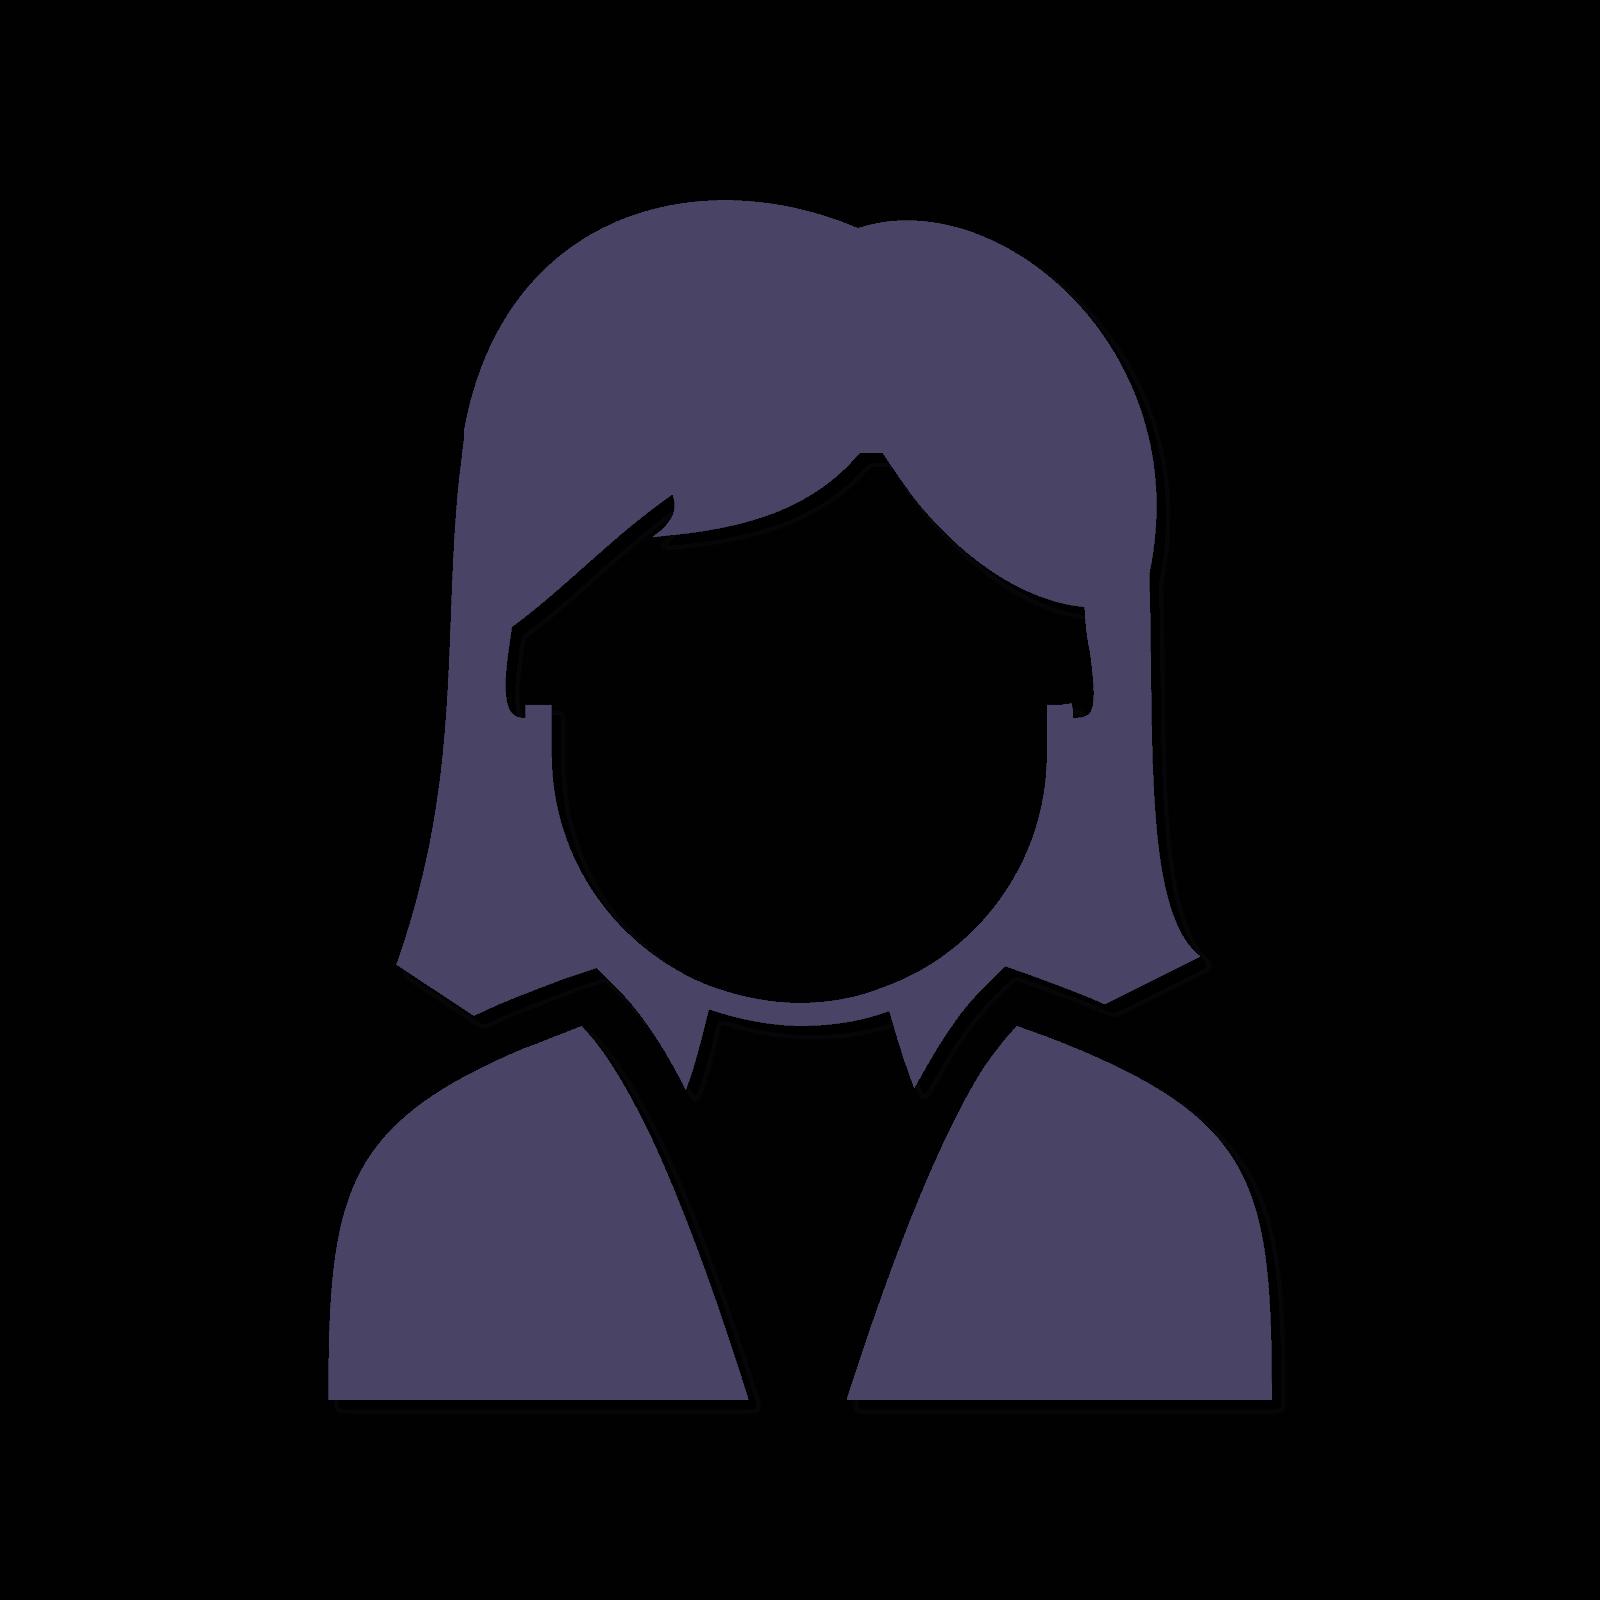 lourdes quiroga icono docente 122 1600x1600 c - Dra. Lourdes Quiroga Etienne